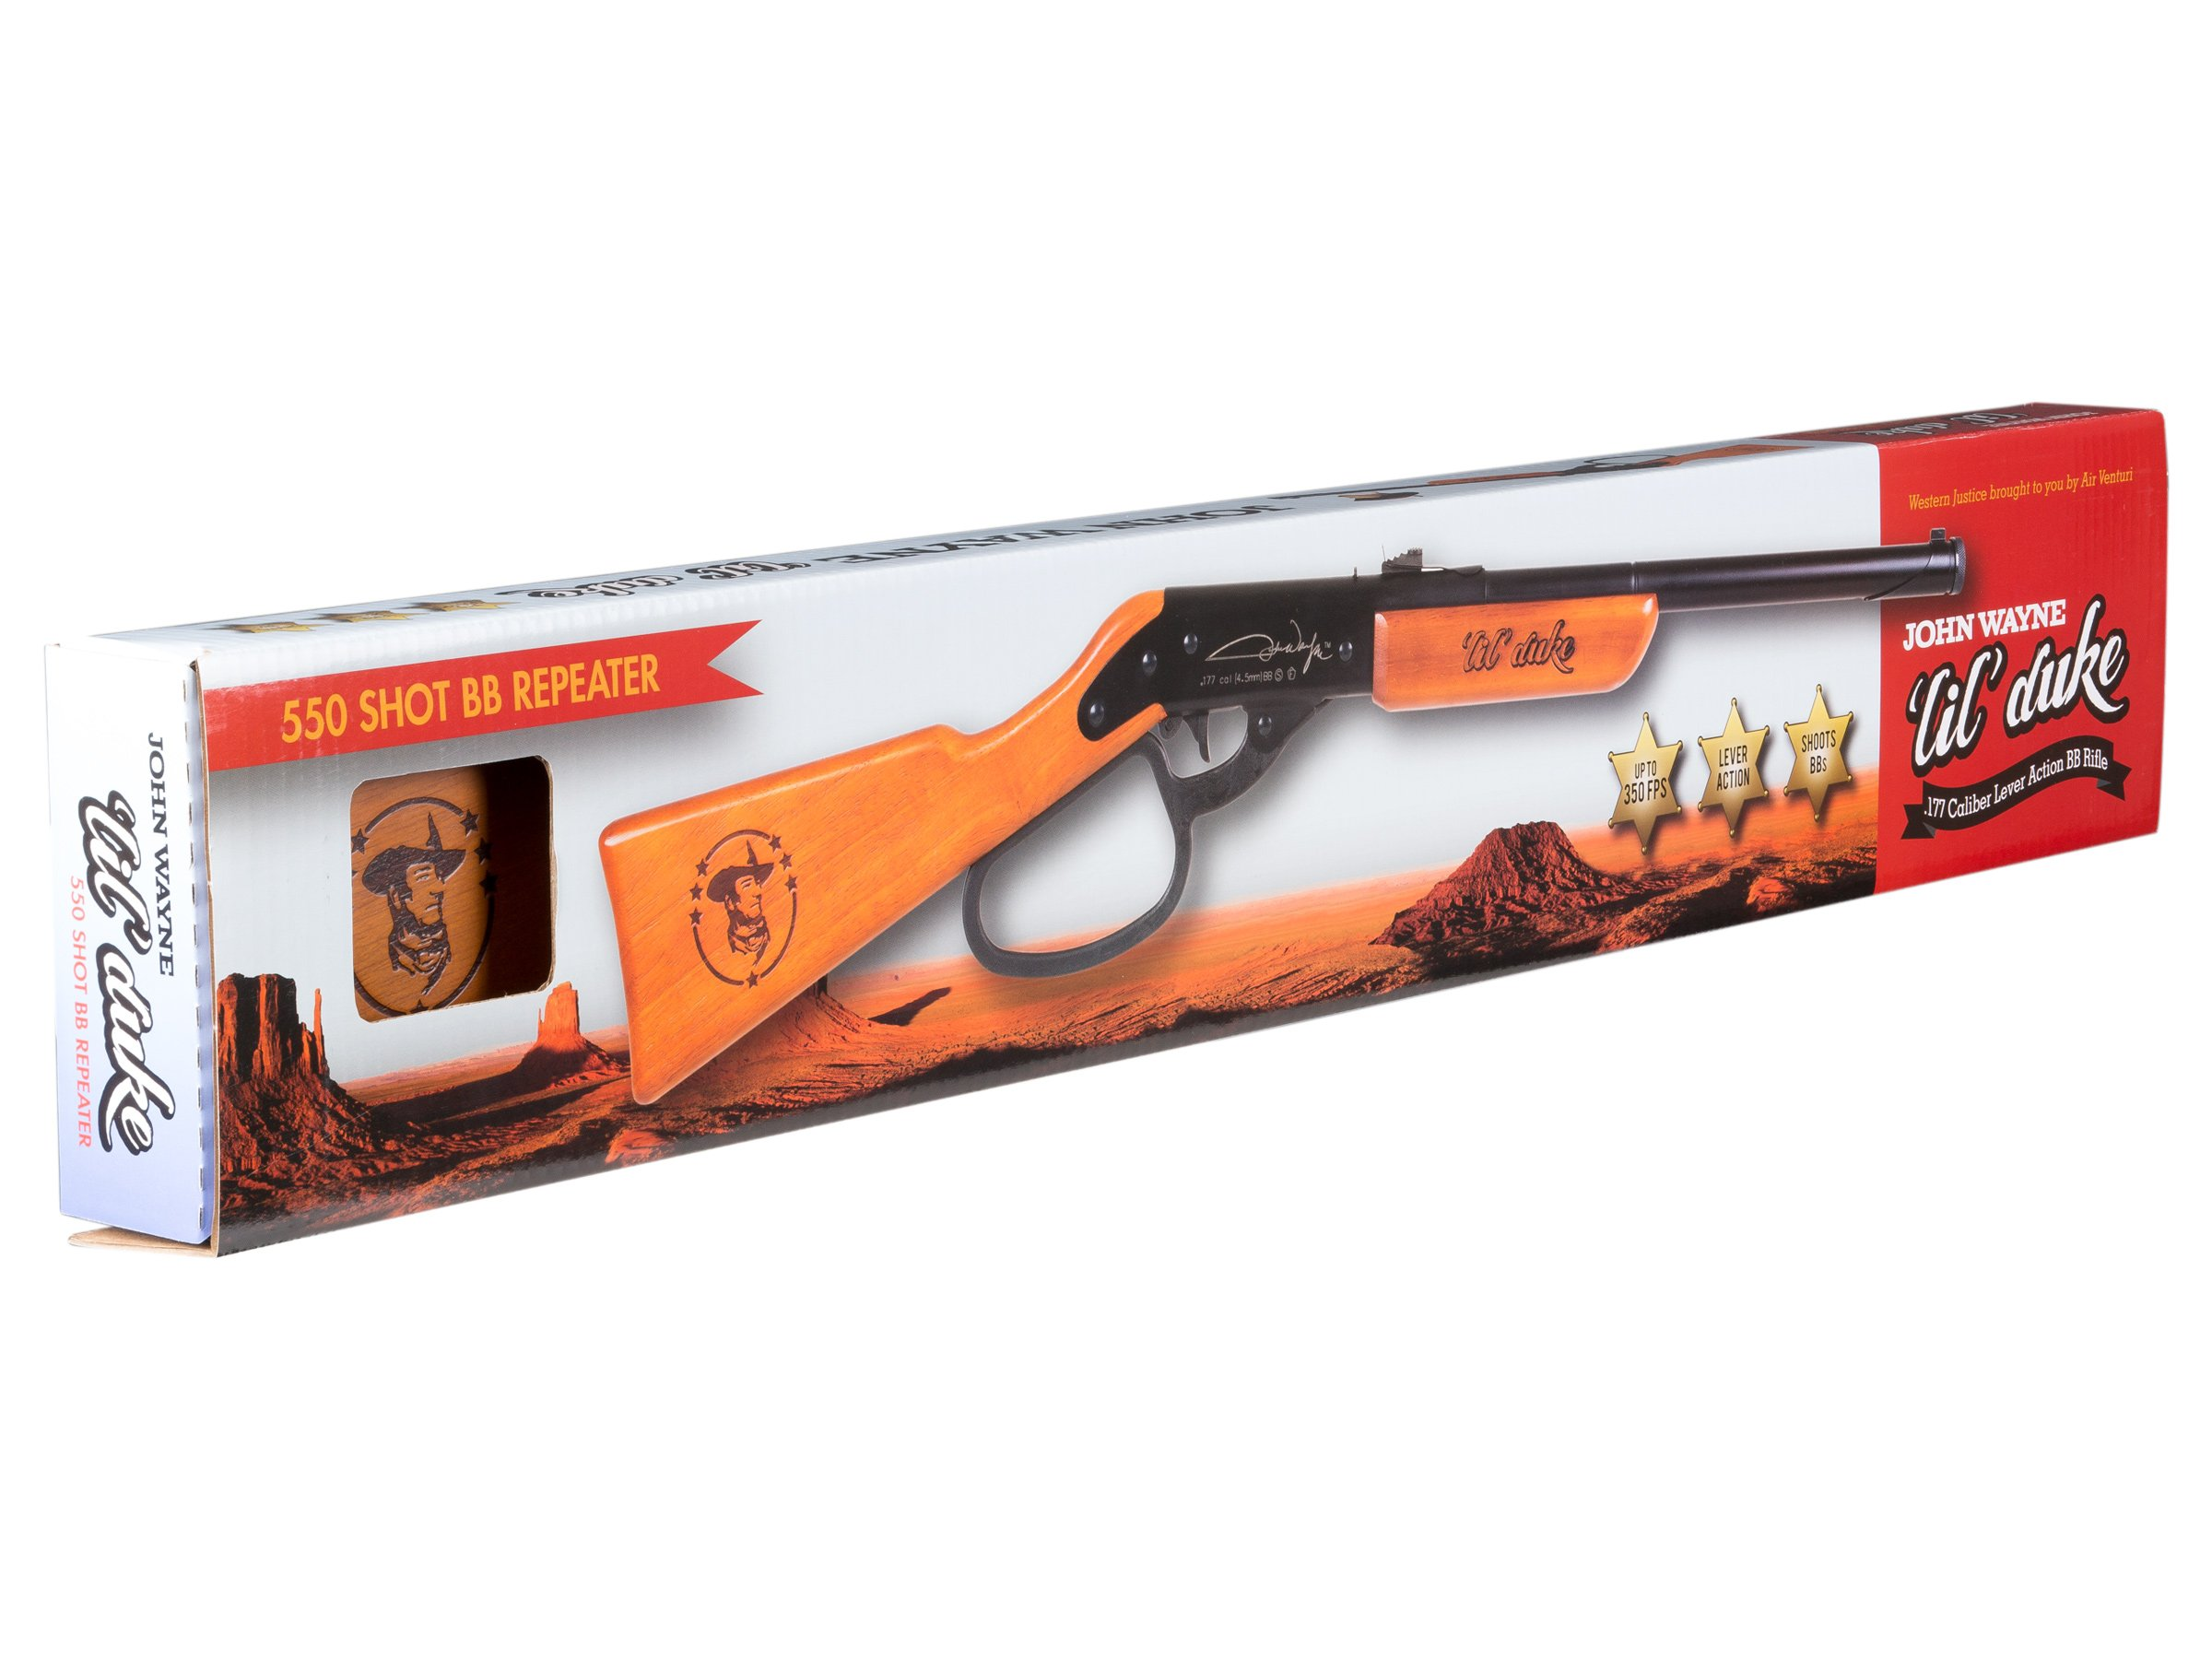 Western Justice John Wayne Lil' Duke BB Gun, Fun Collectible